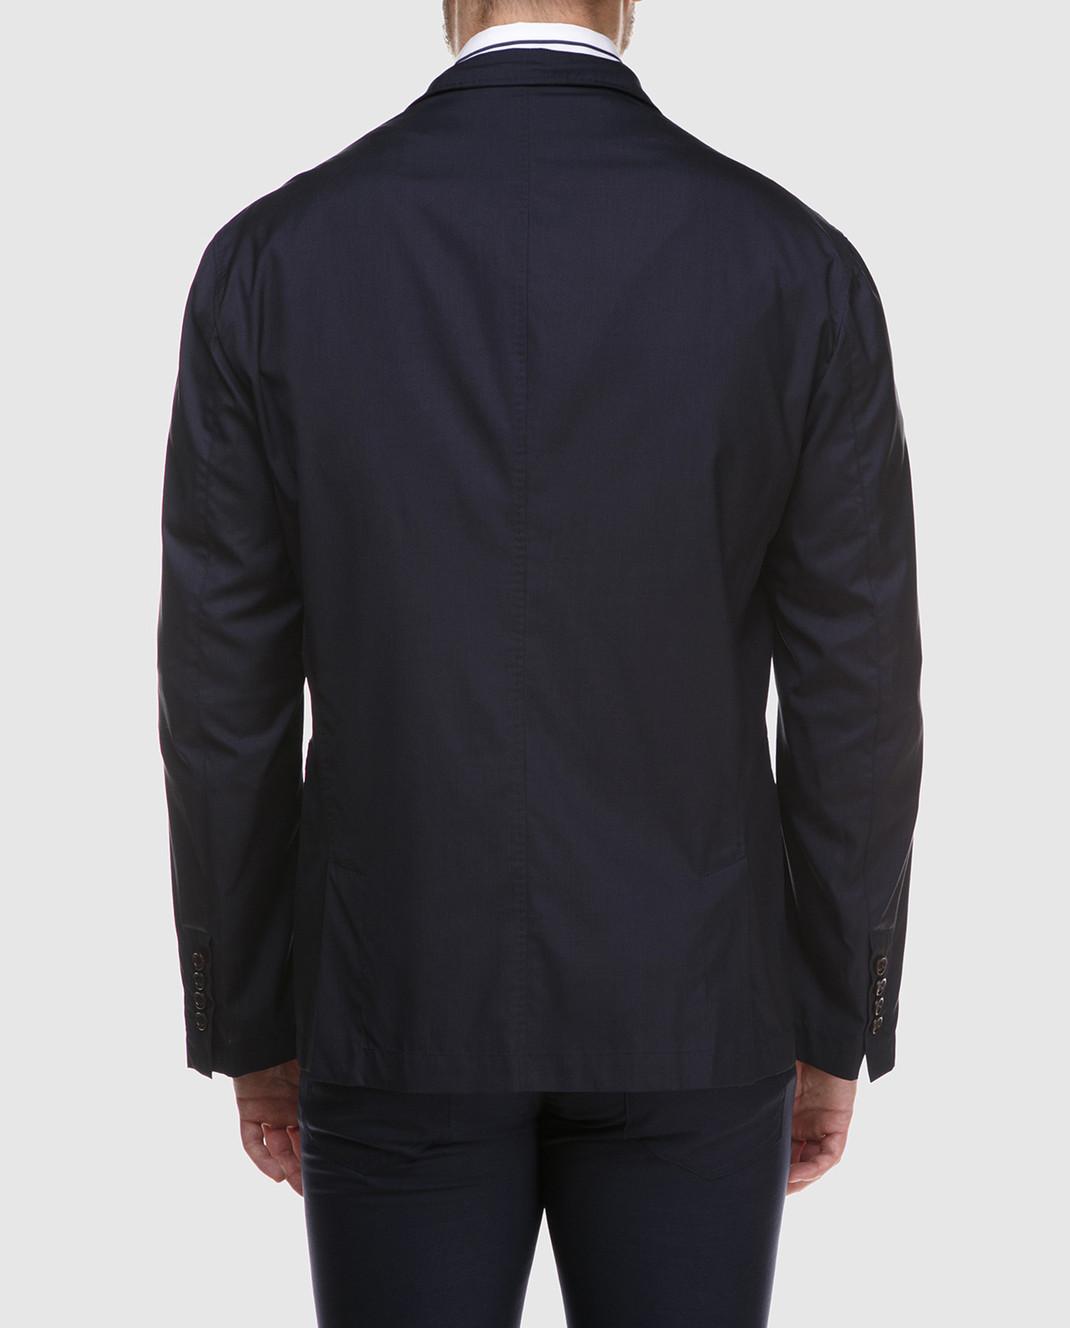 Brunello Cucinelli Темно-синий пиджак MH4626132 изображение 4